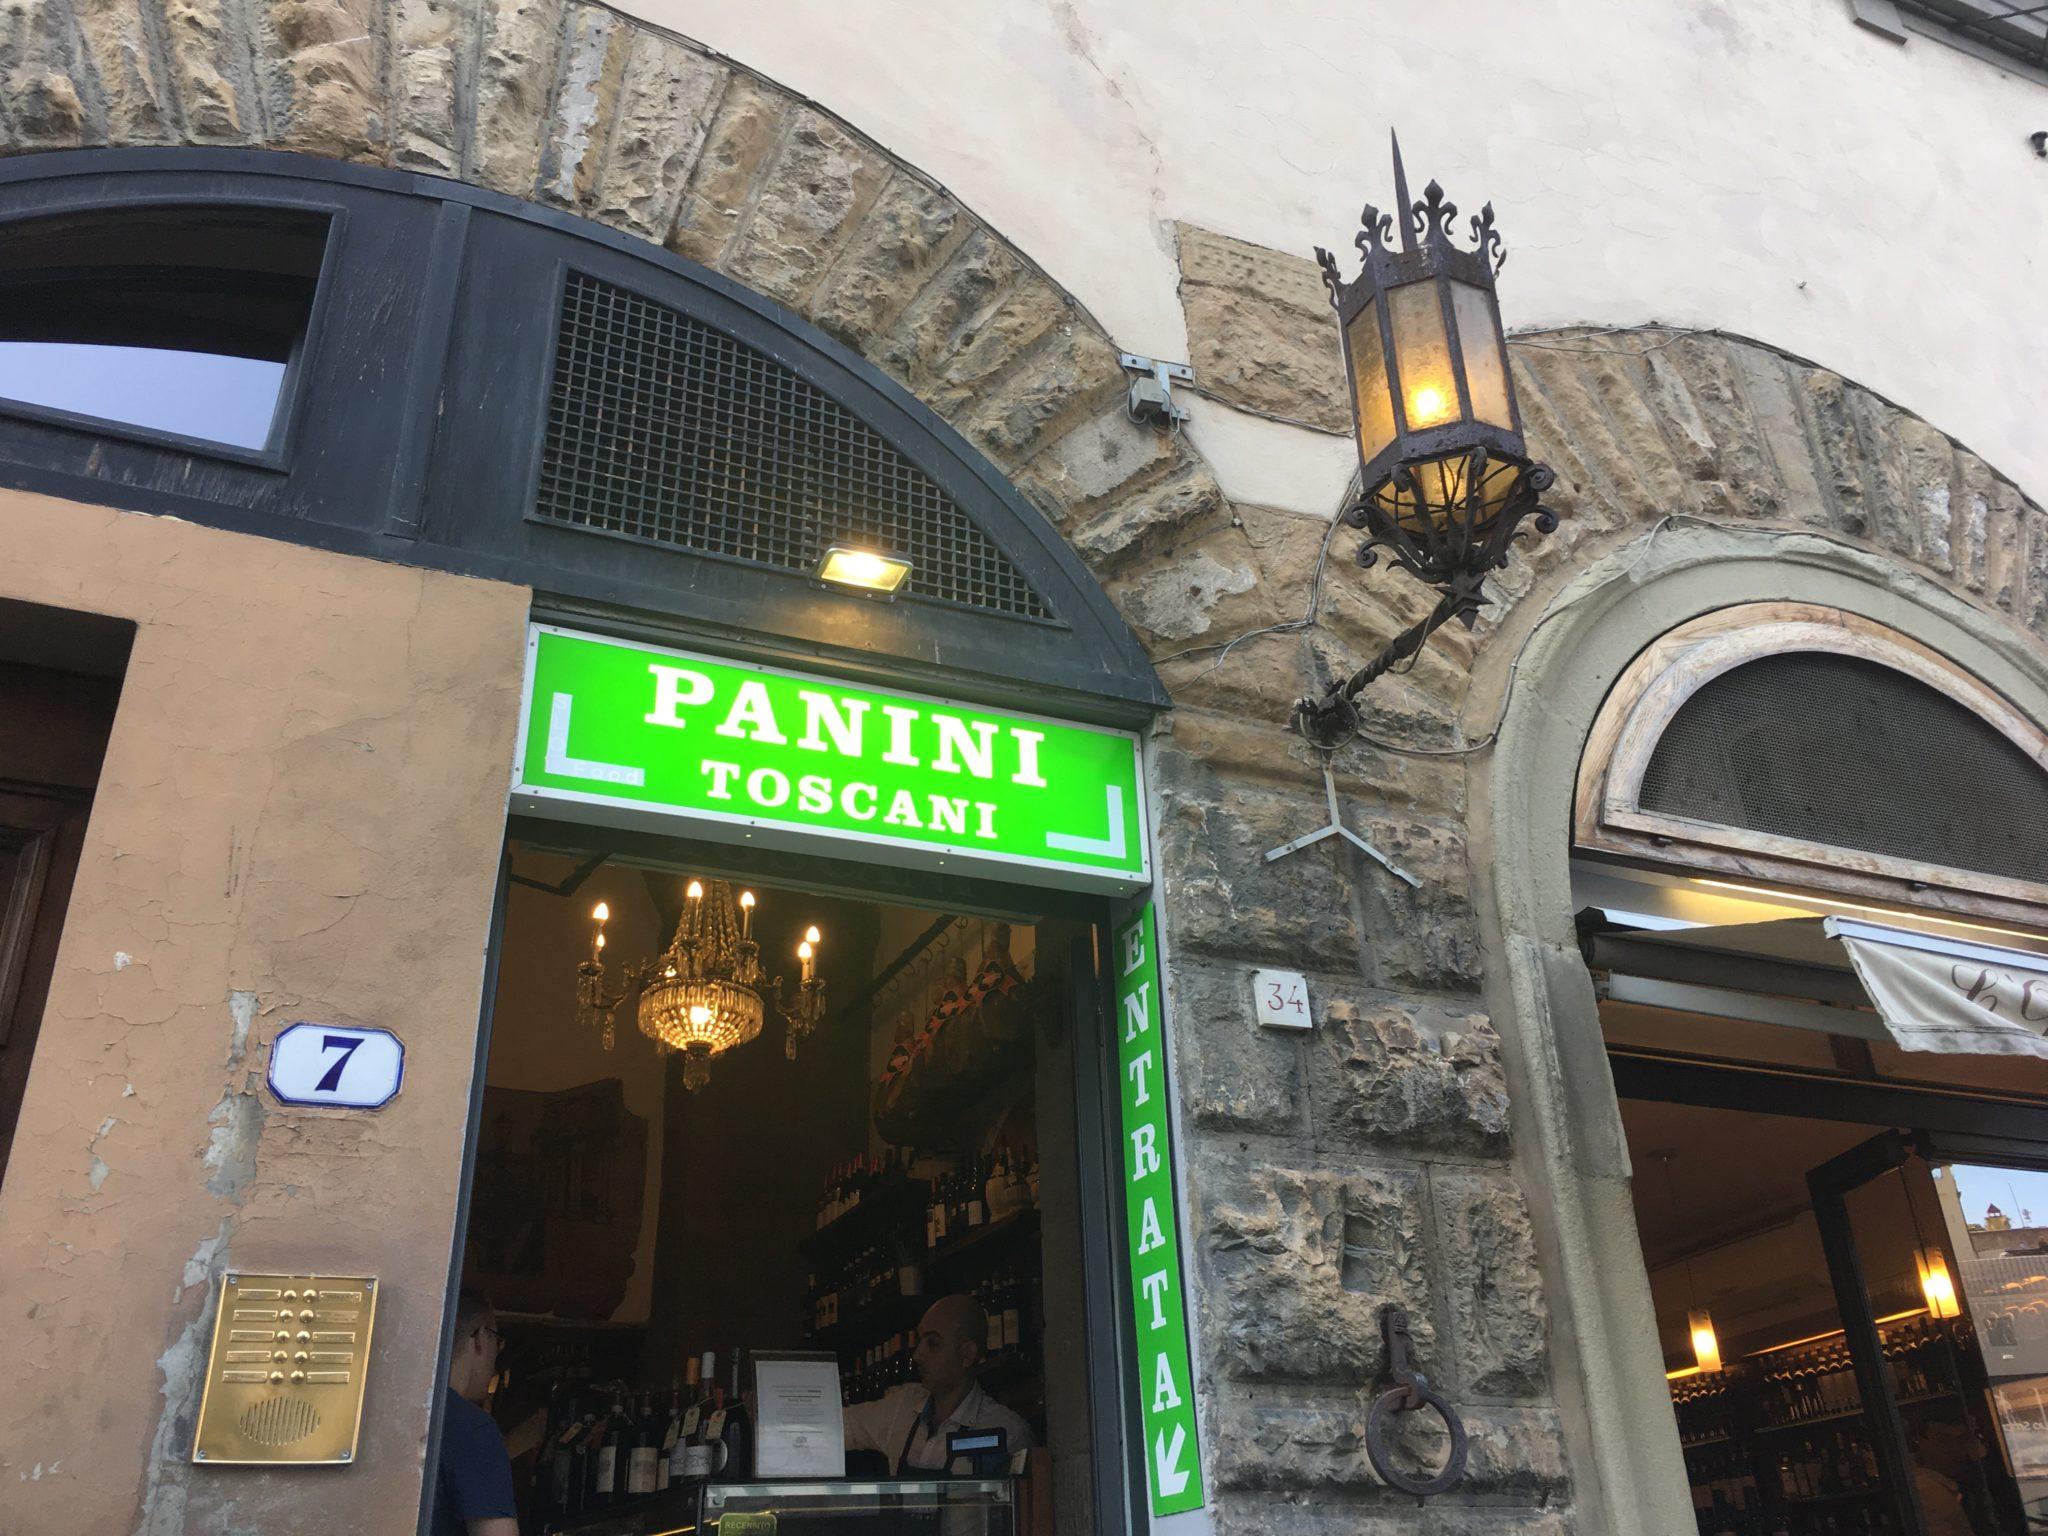 Panini Toscani